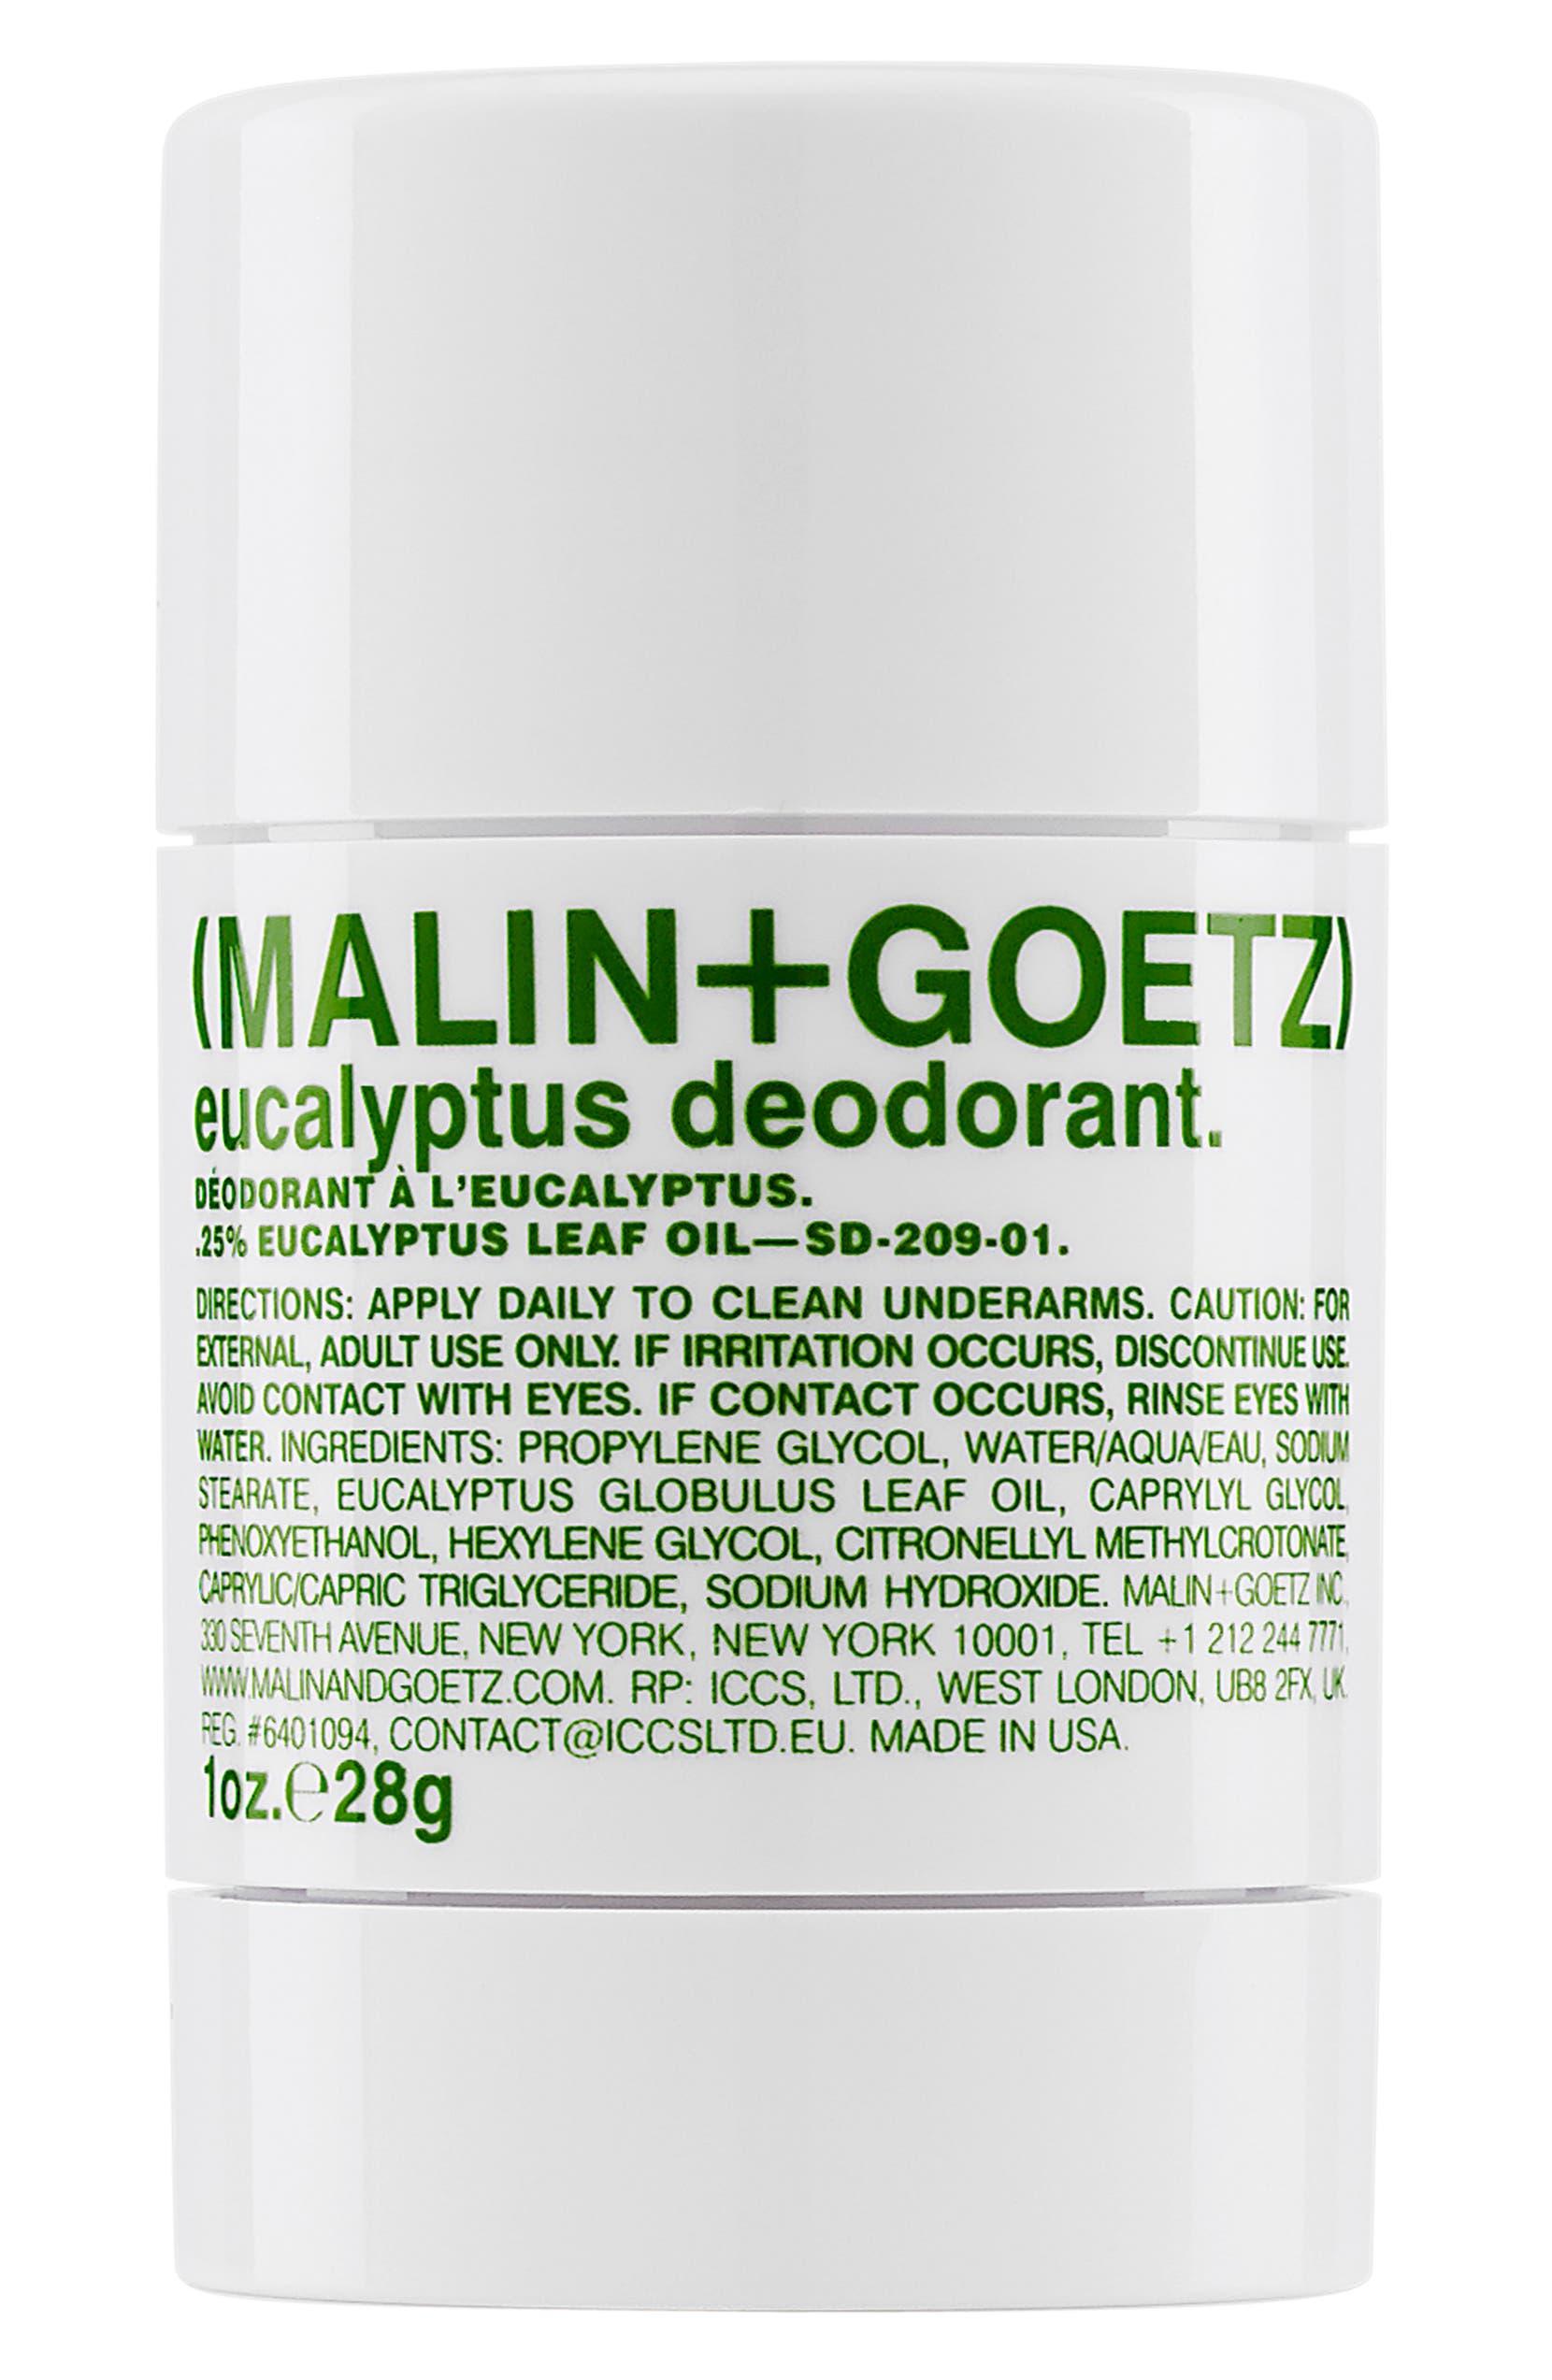 Malin Goetz Eucalyptus Deodorant Nordstrom Gieve Hair Conditioner